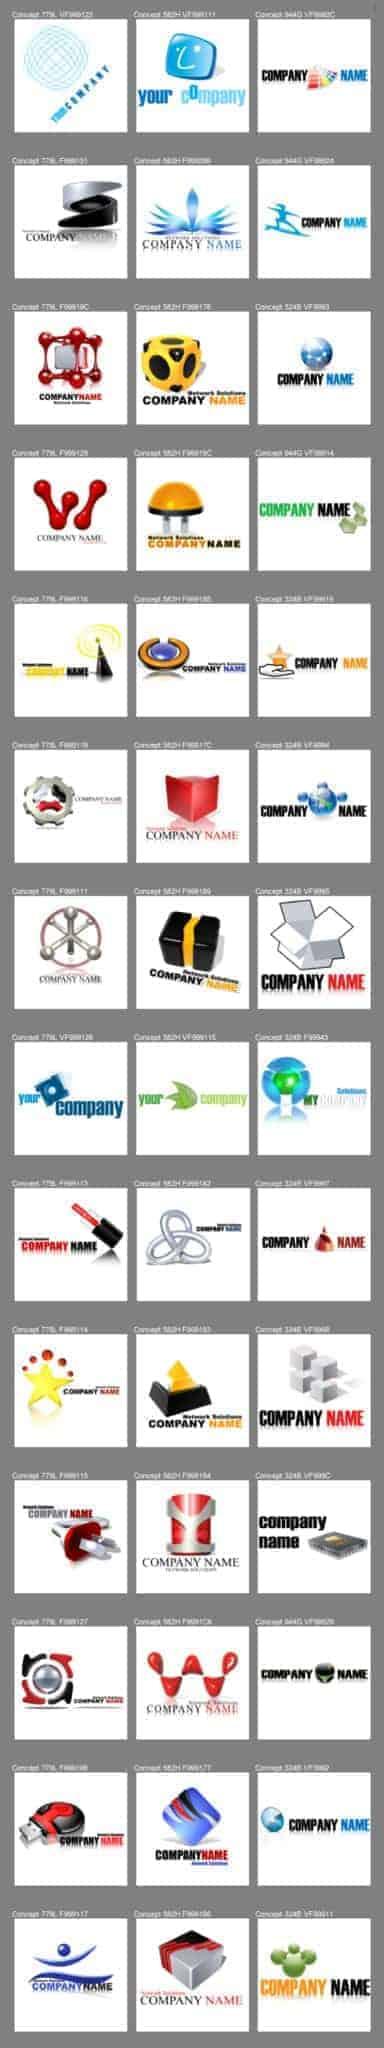 best brand logo elements